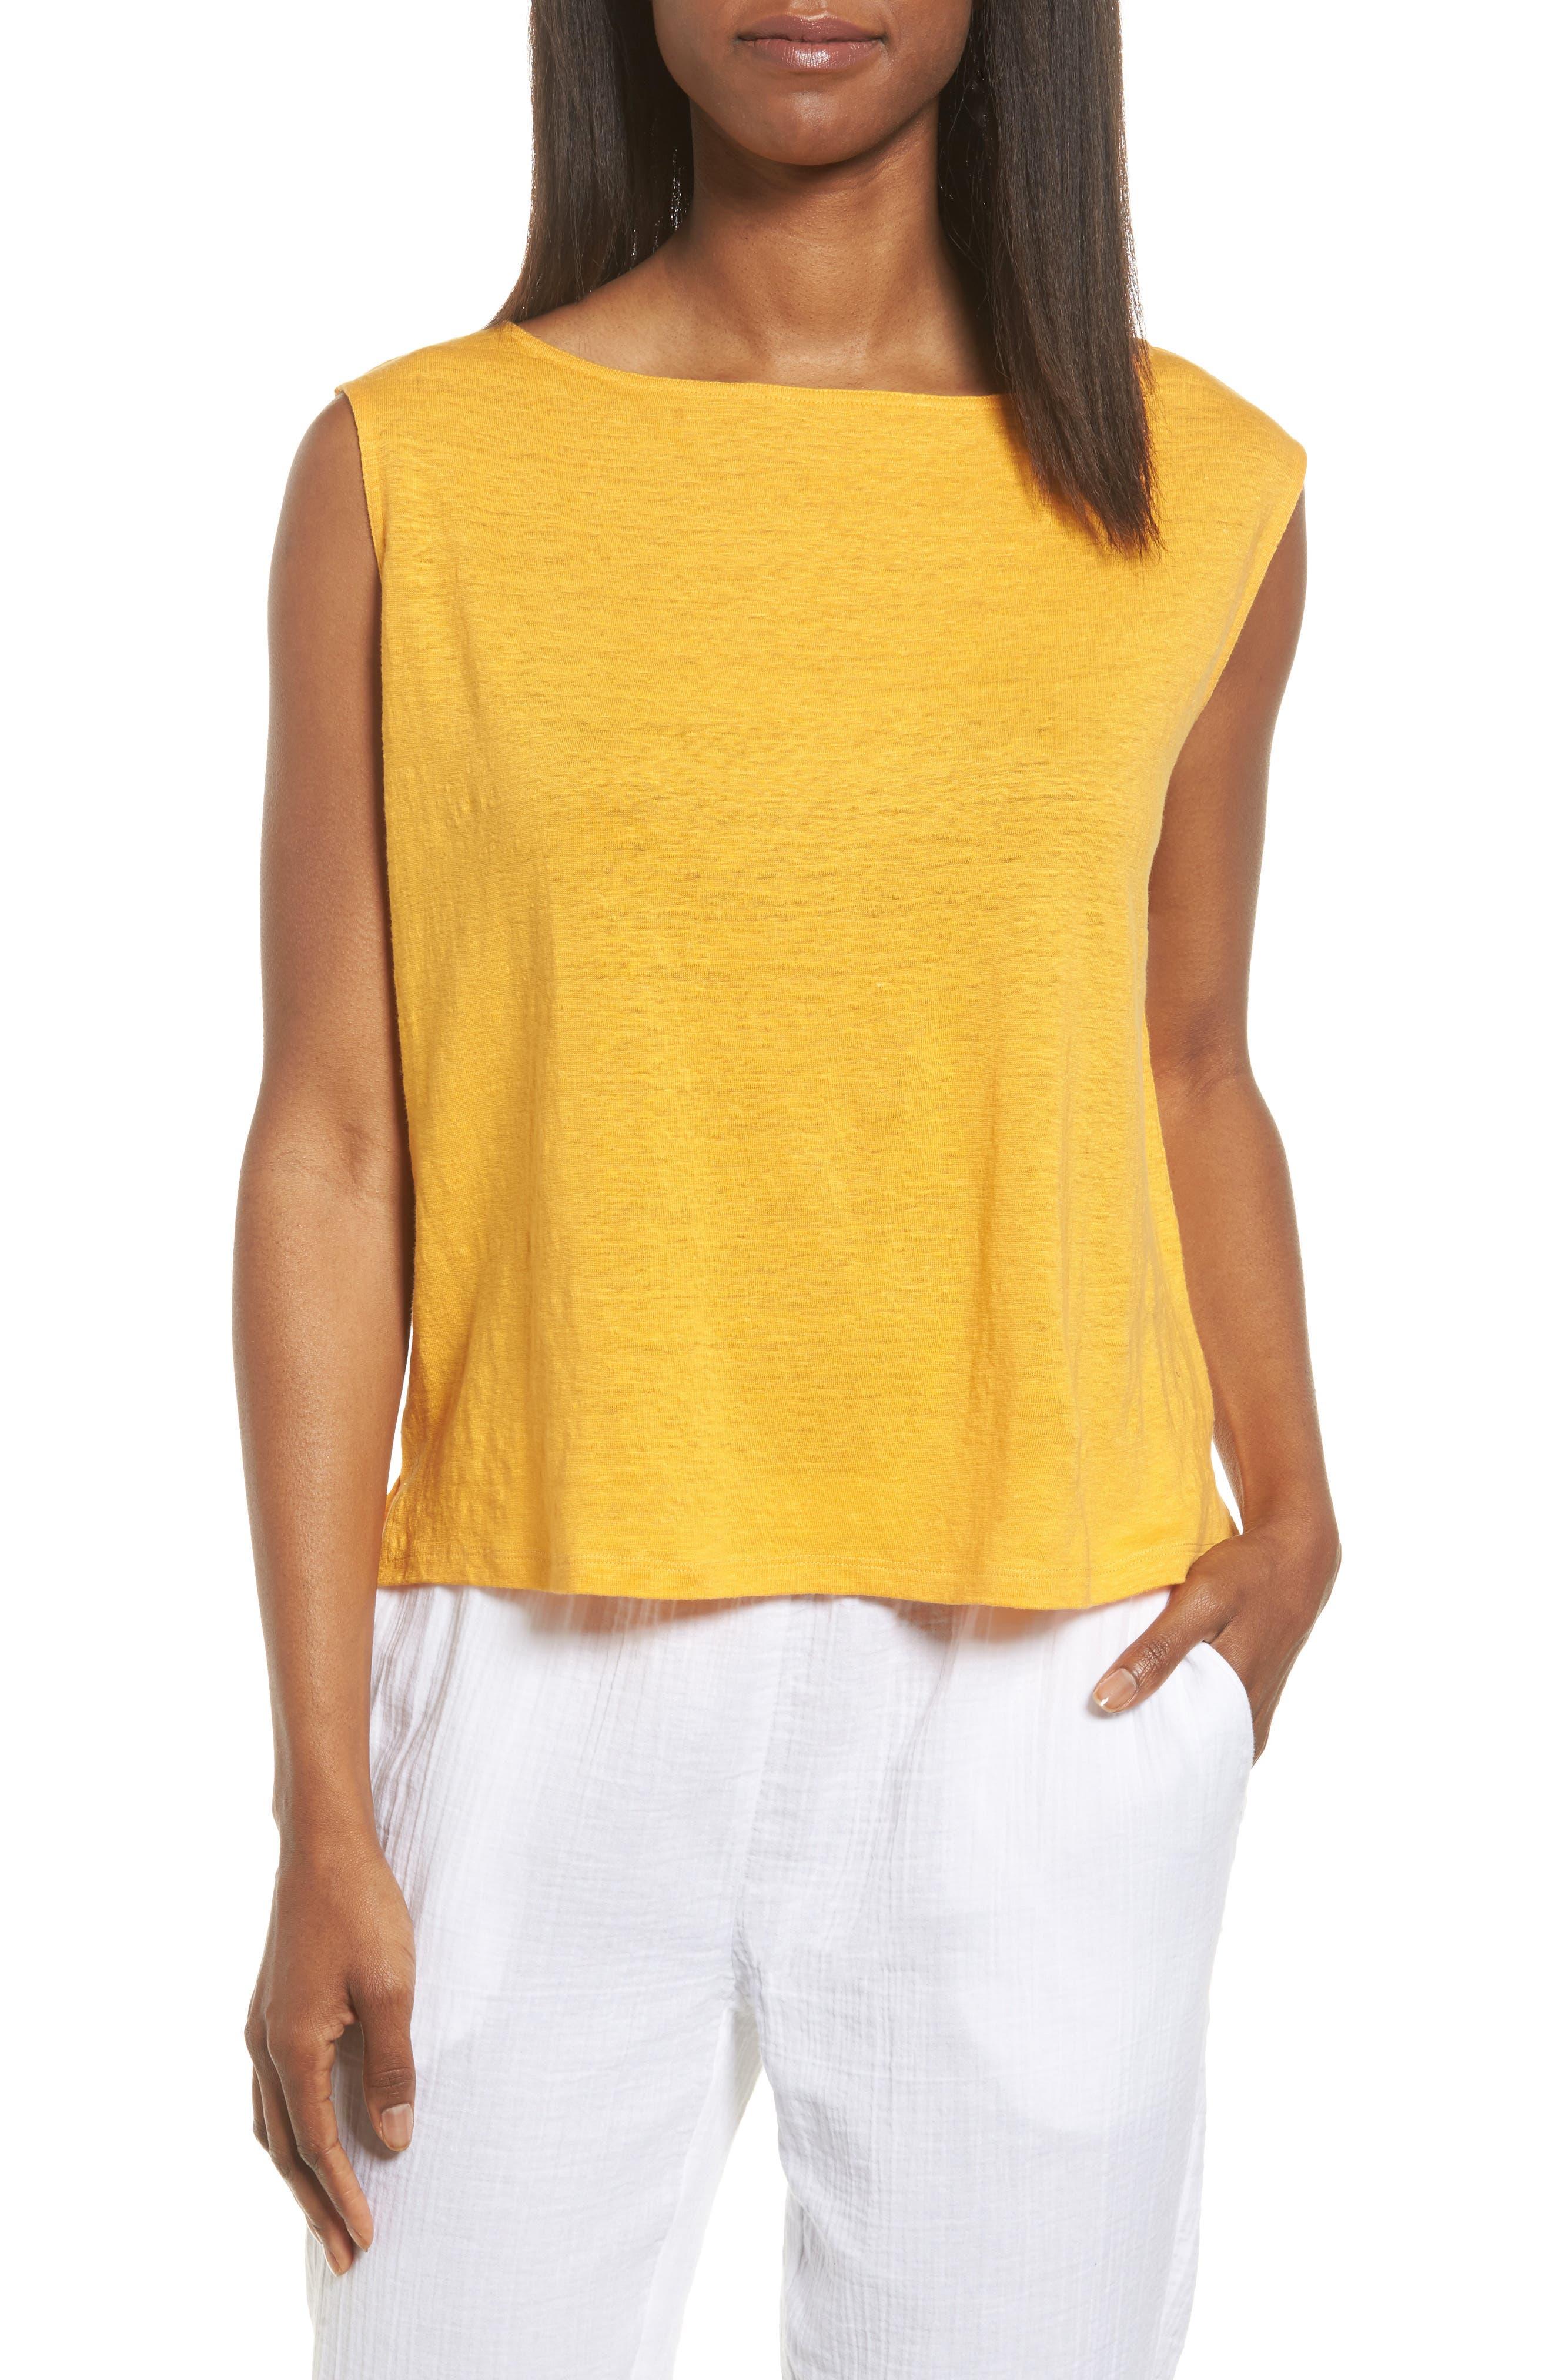 Main Image - Eileen Fisher Organic Linen Top (Regular & Petite)